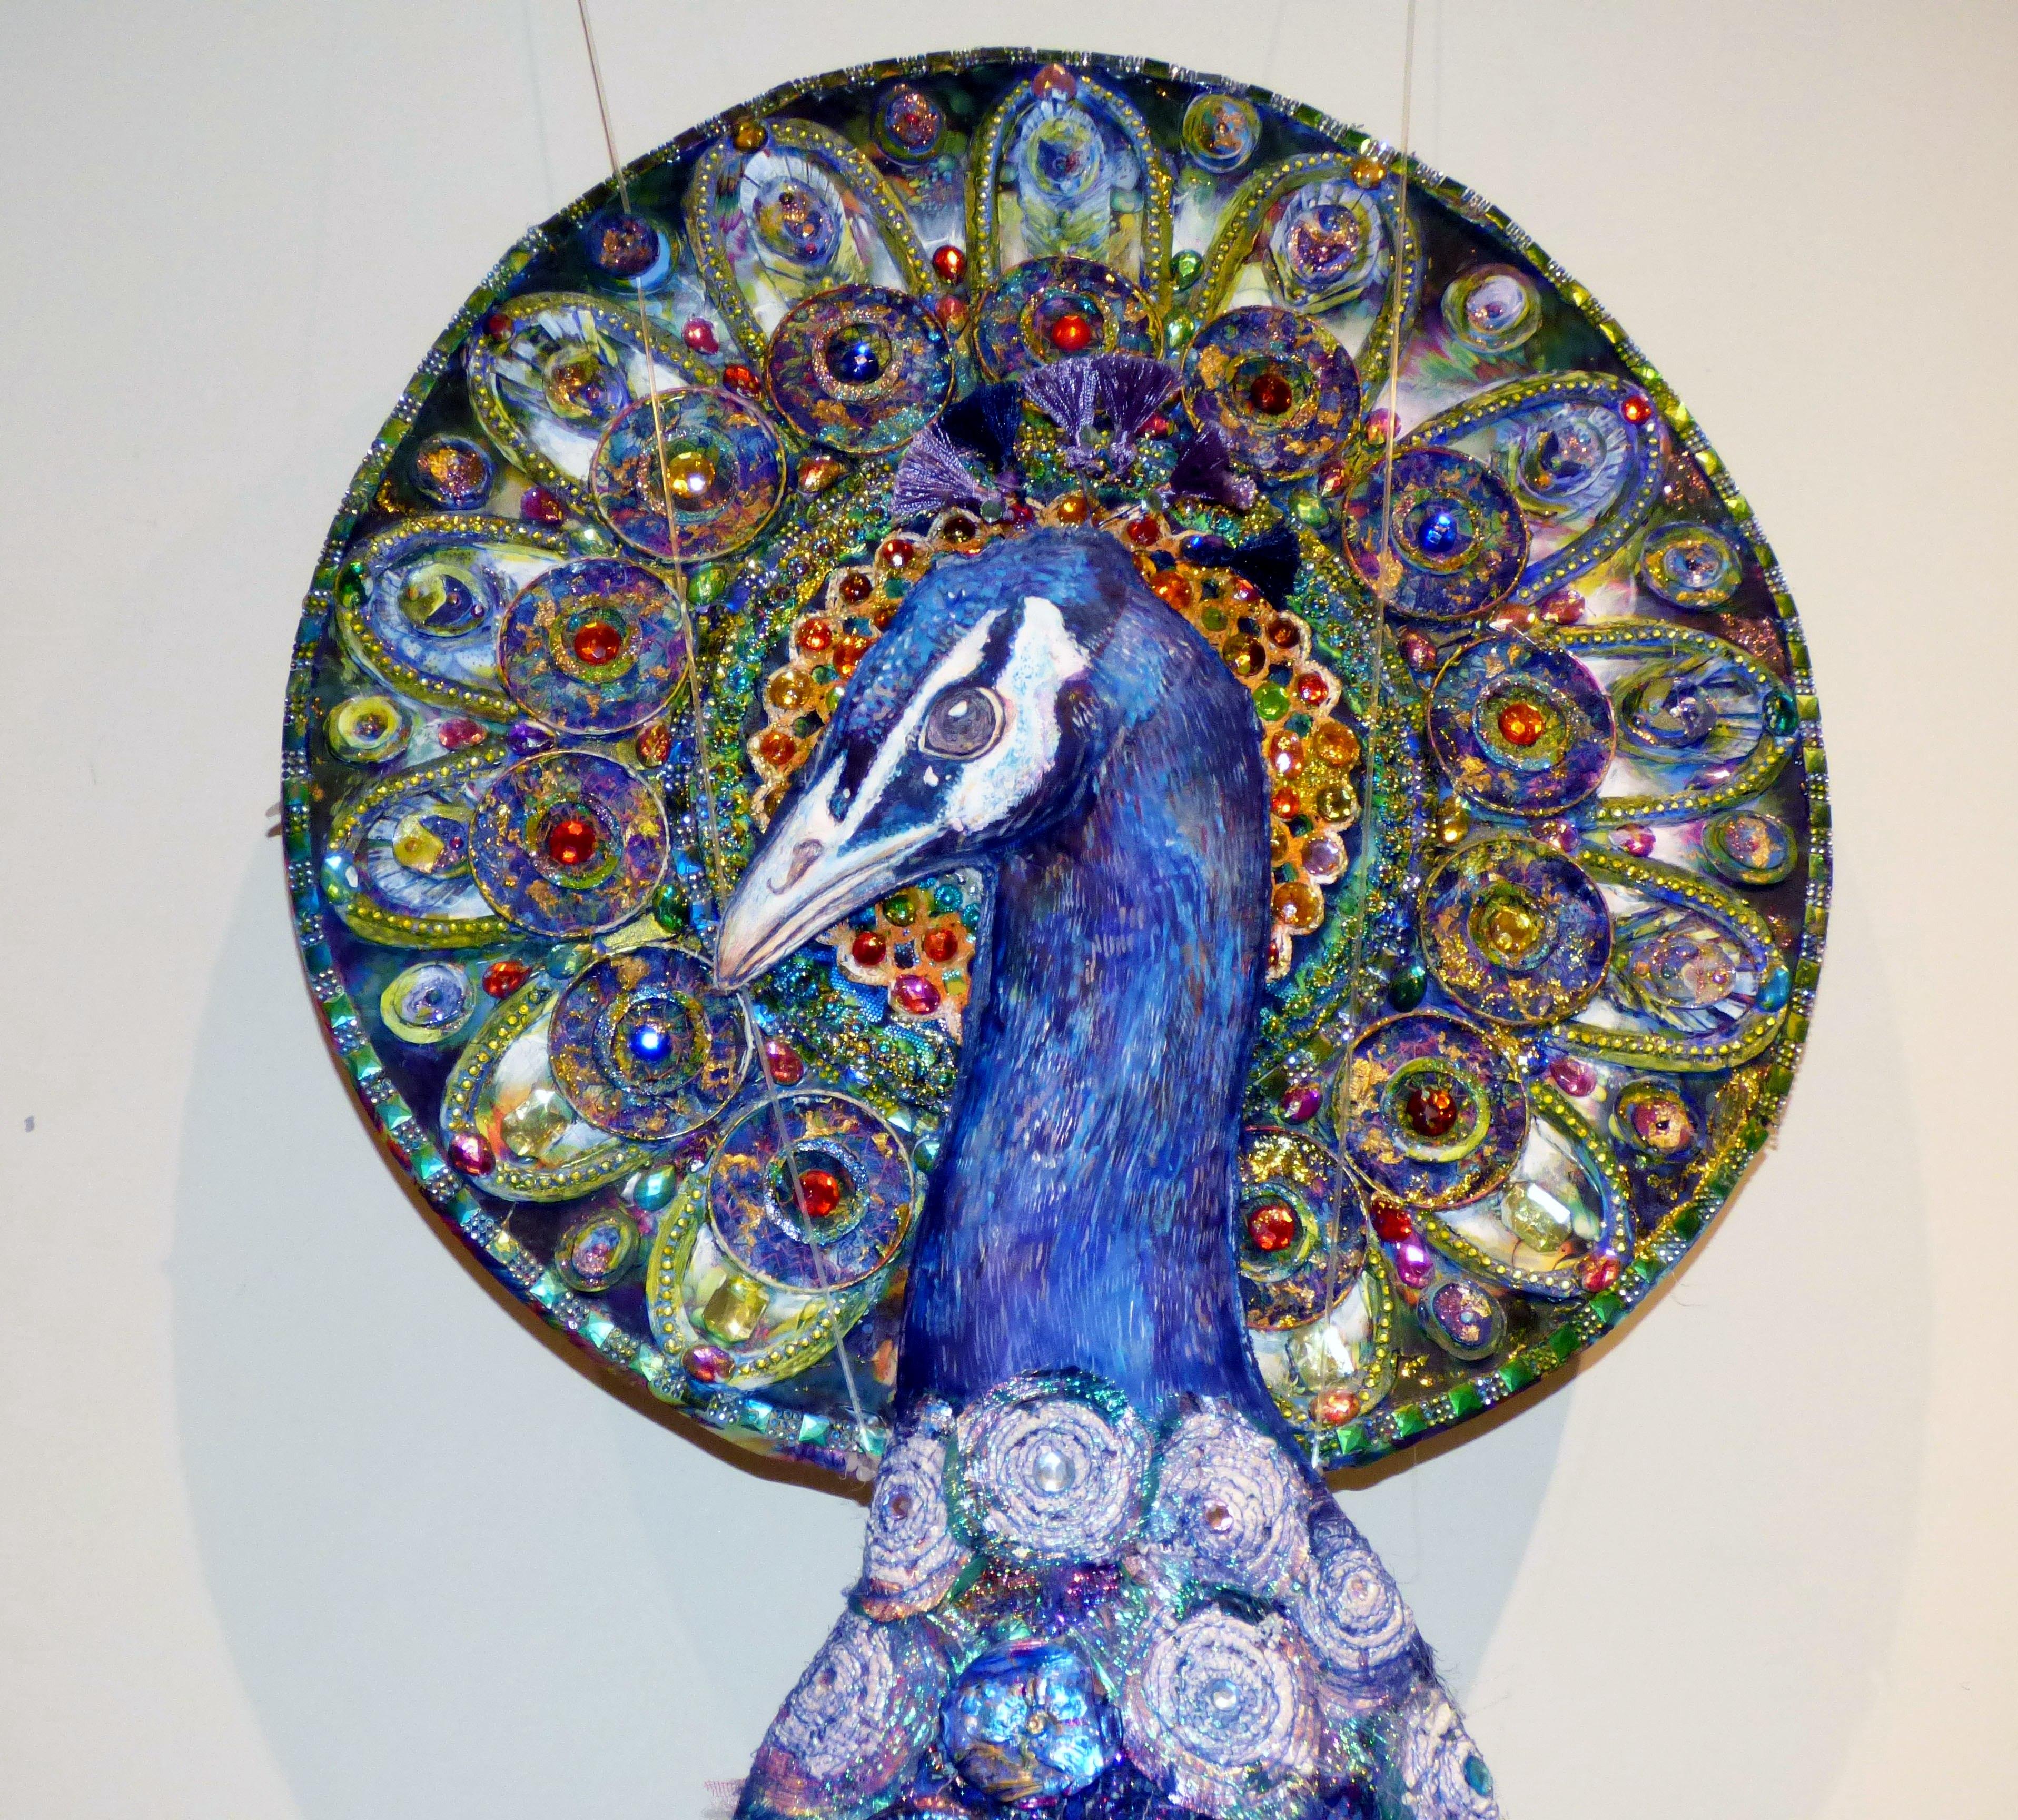 (detail) THE SILK PEACOCK by Nikki Parmenter, Gawthorpe Hall, Sept 2020